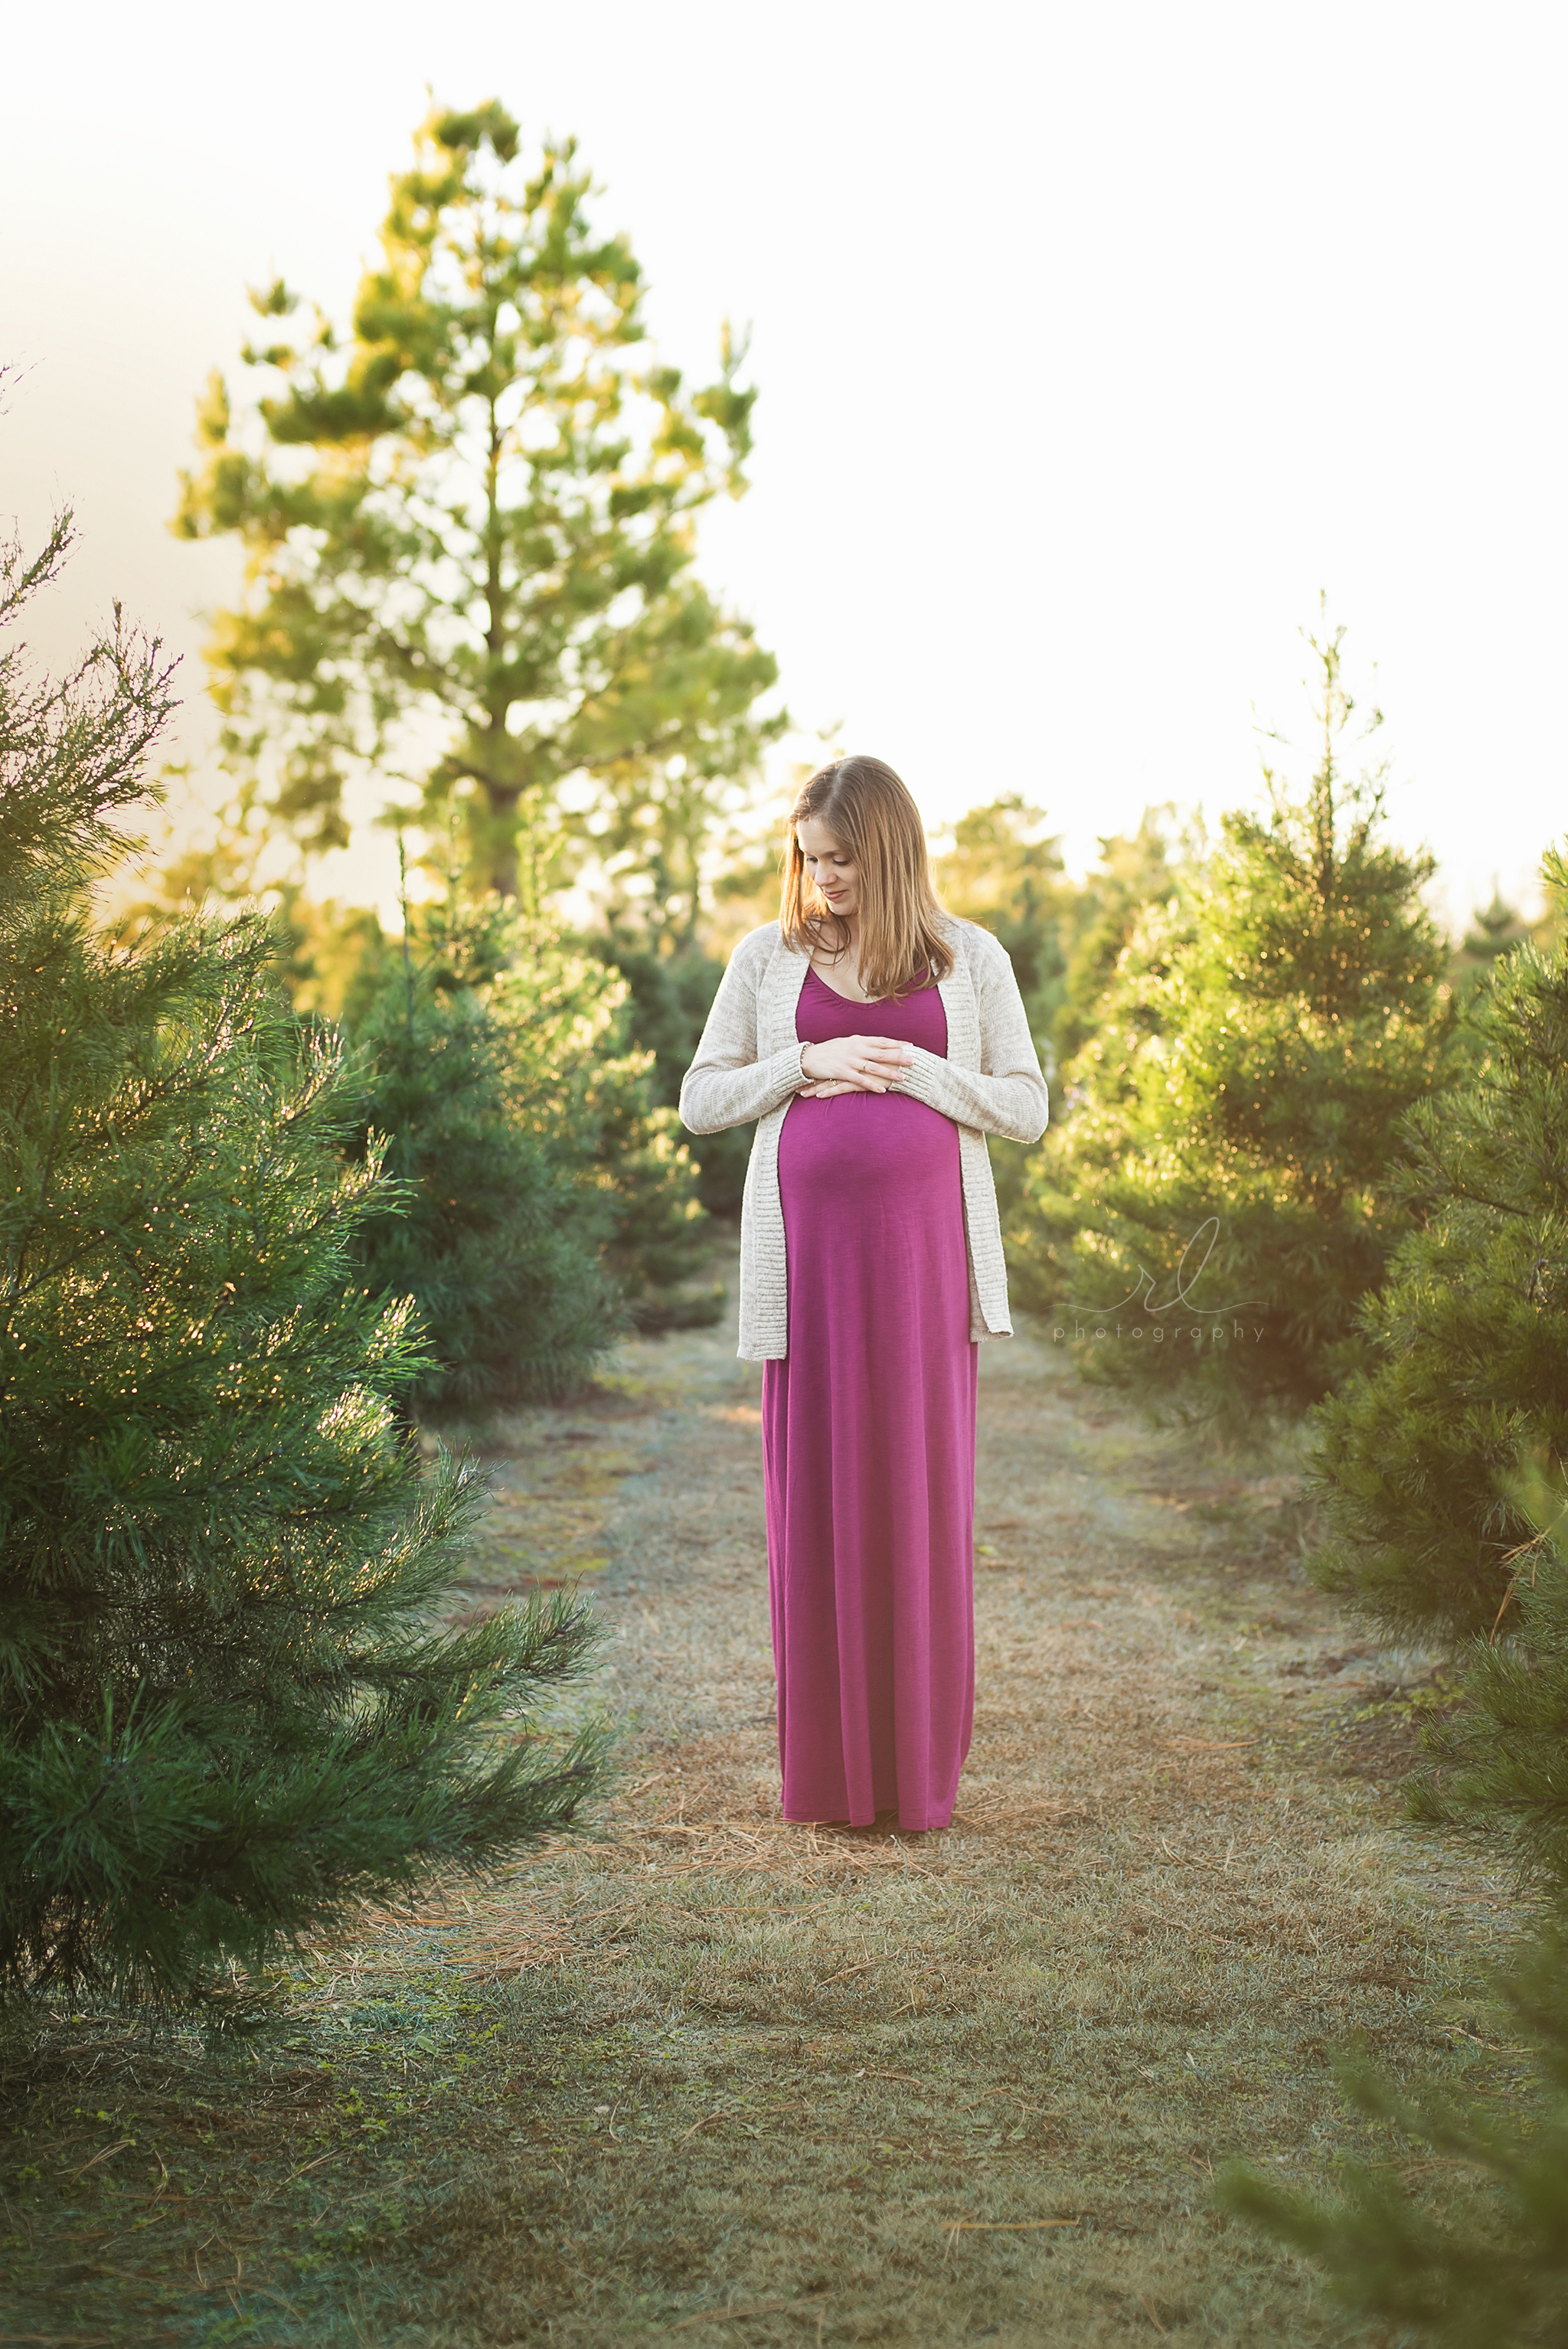 Oklahoma City Maternity Pictures - RL Photography 6.jpg